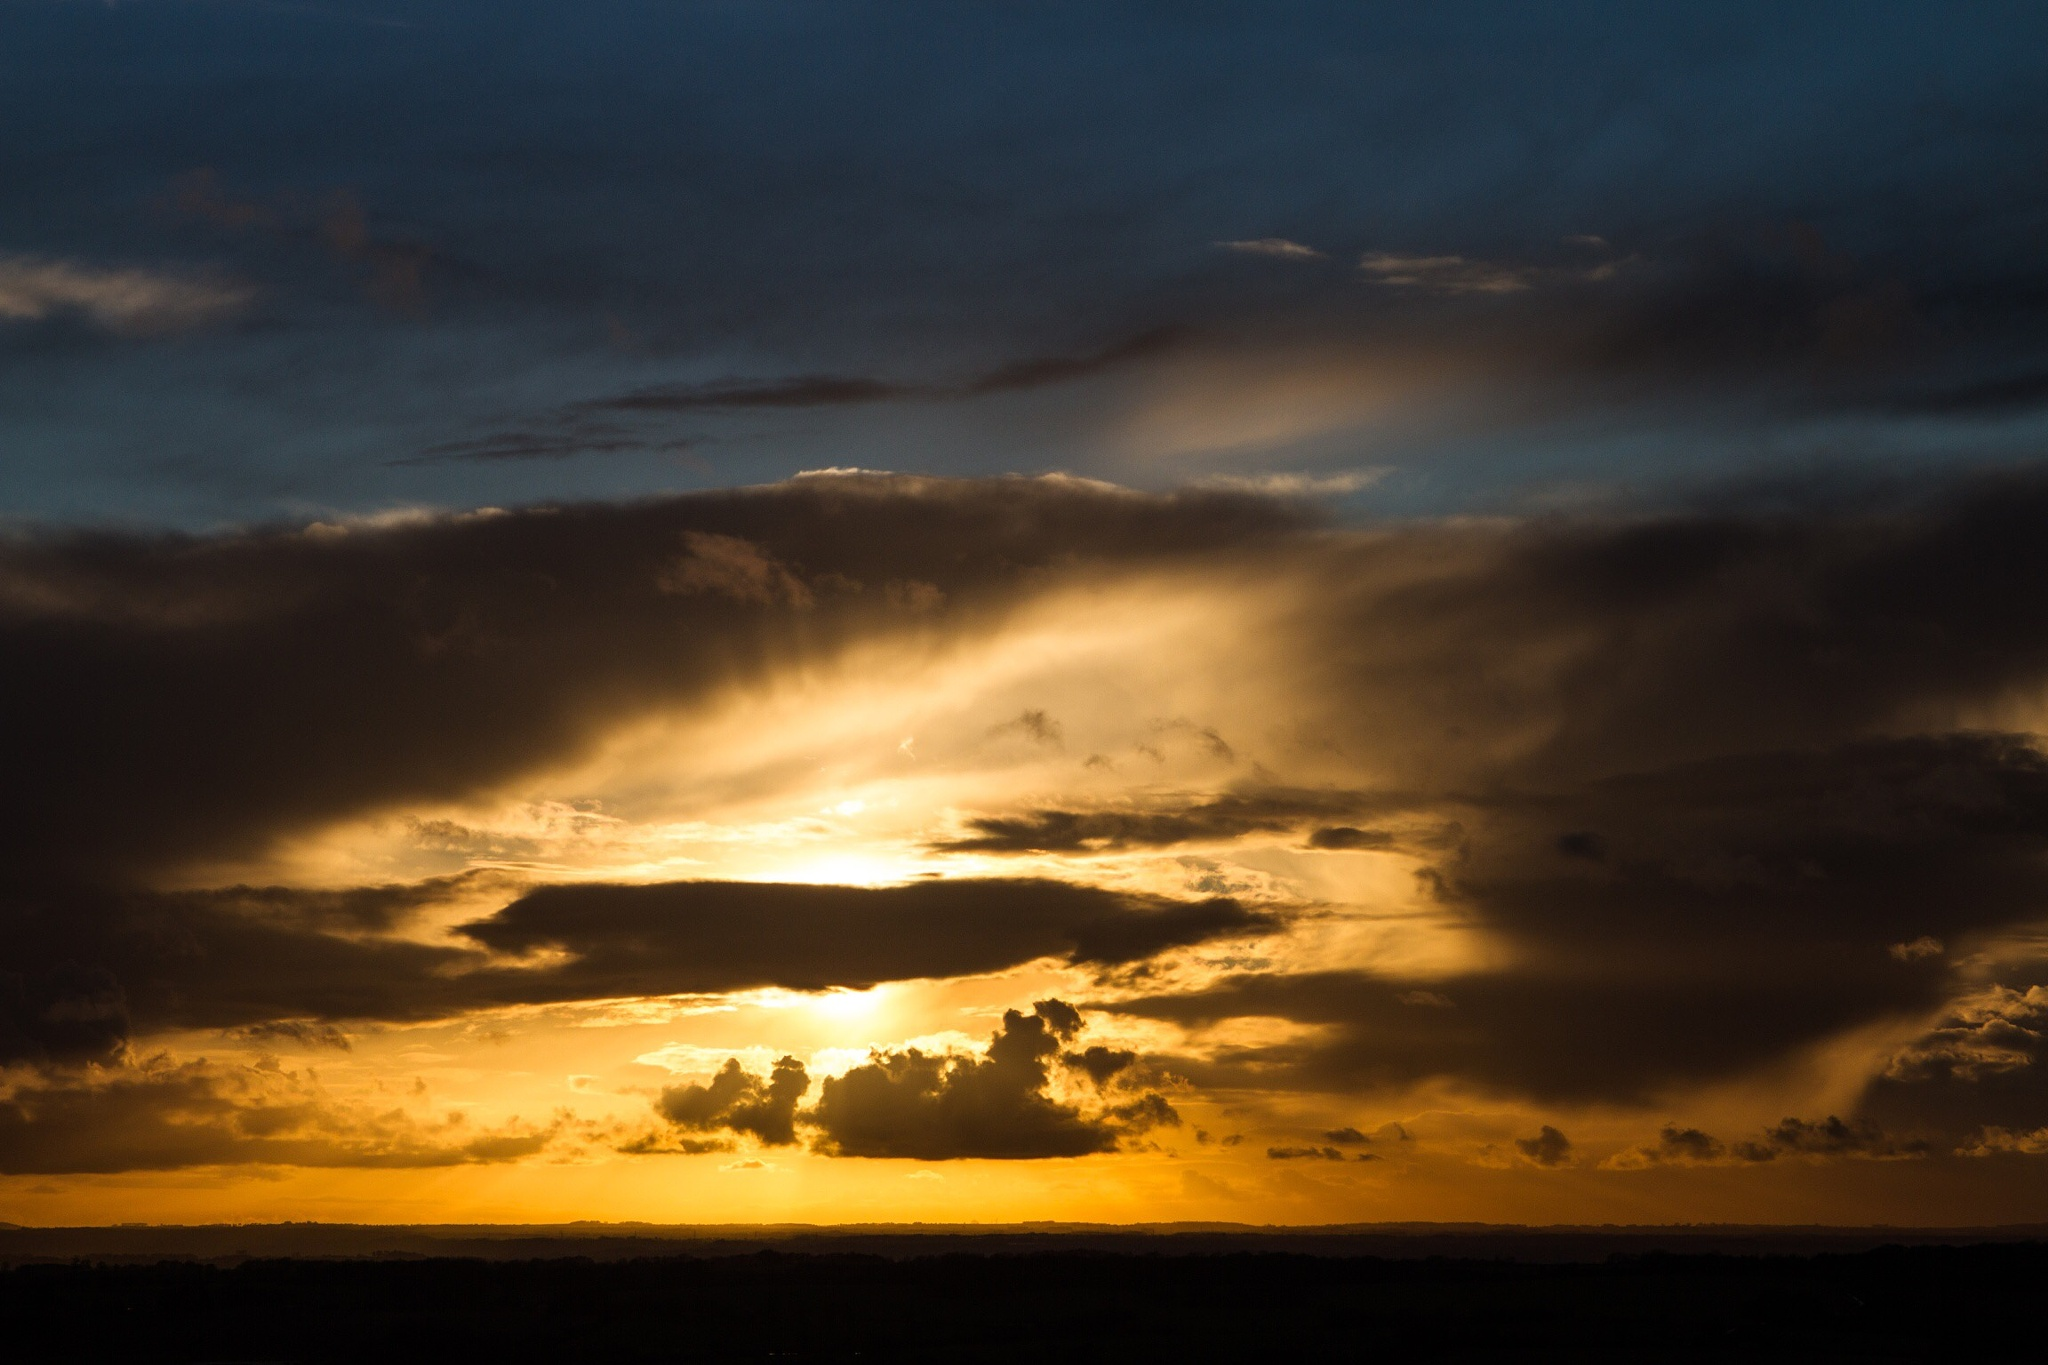 Ridgeway evening by Steve Blundell